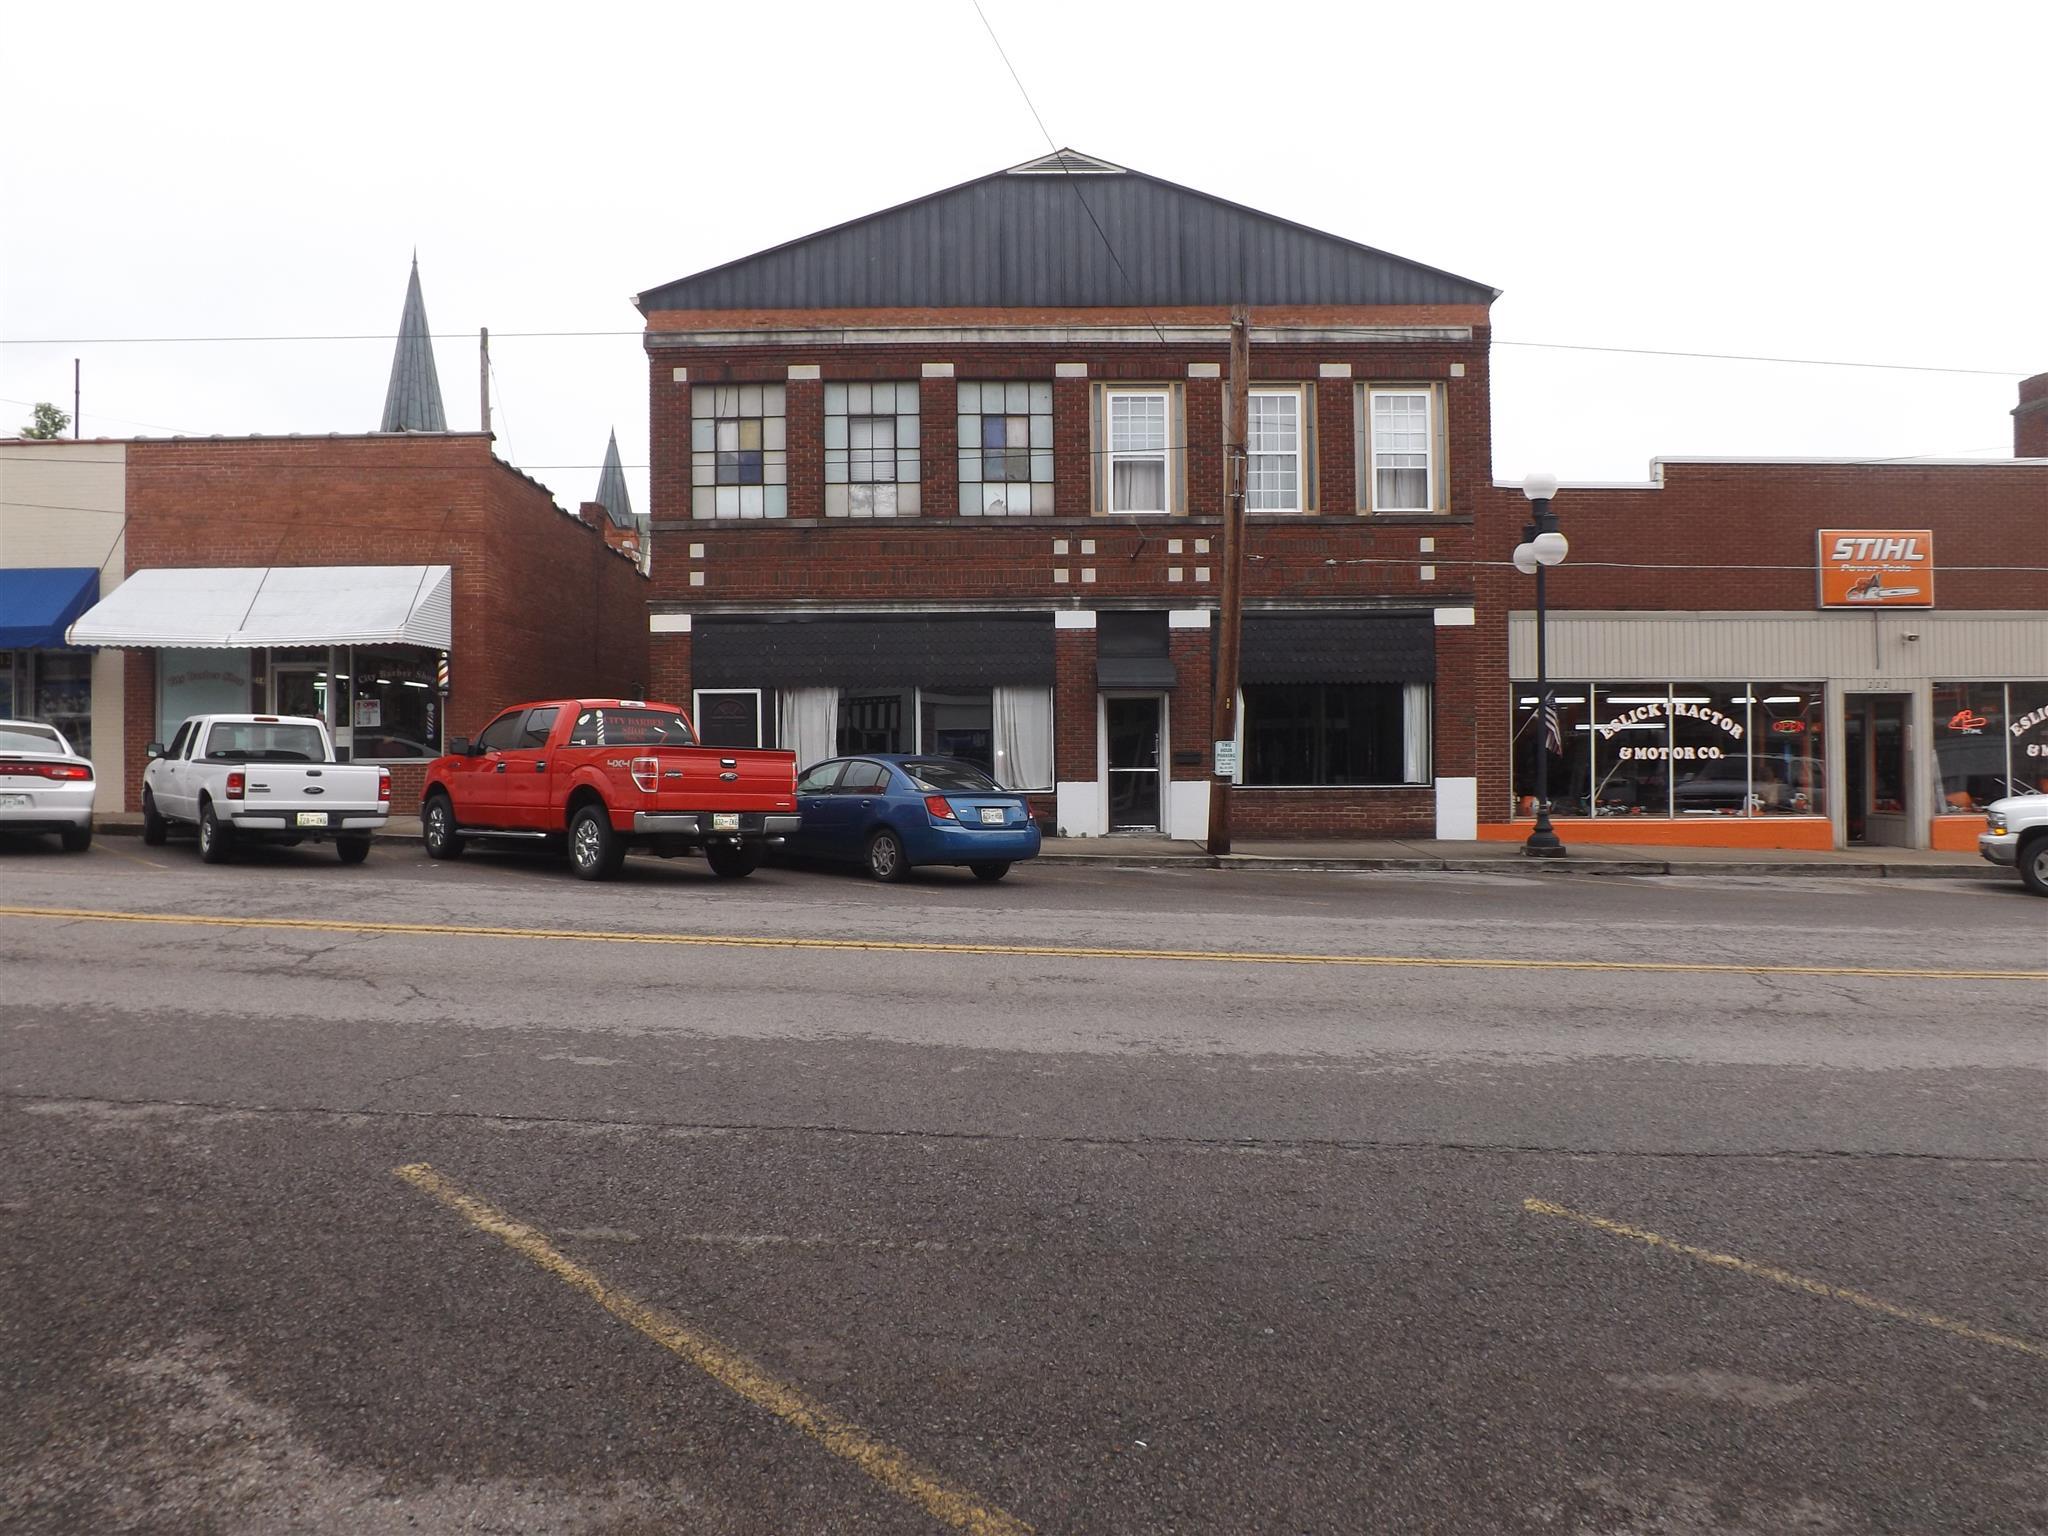 218 N 1St St, Pulaski, TN 38478 - Pulaski, TN real estate listing